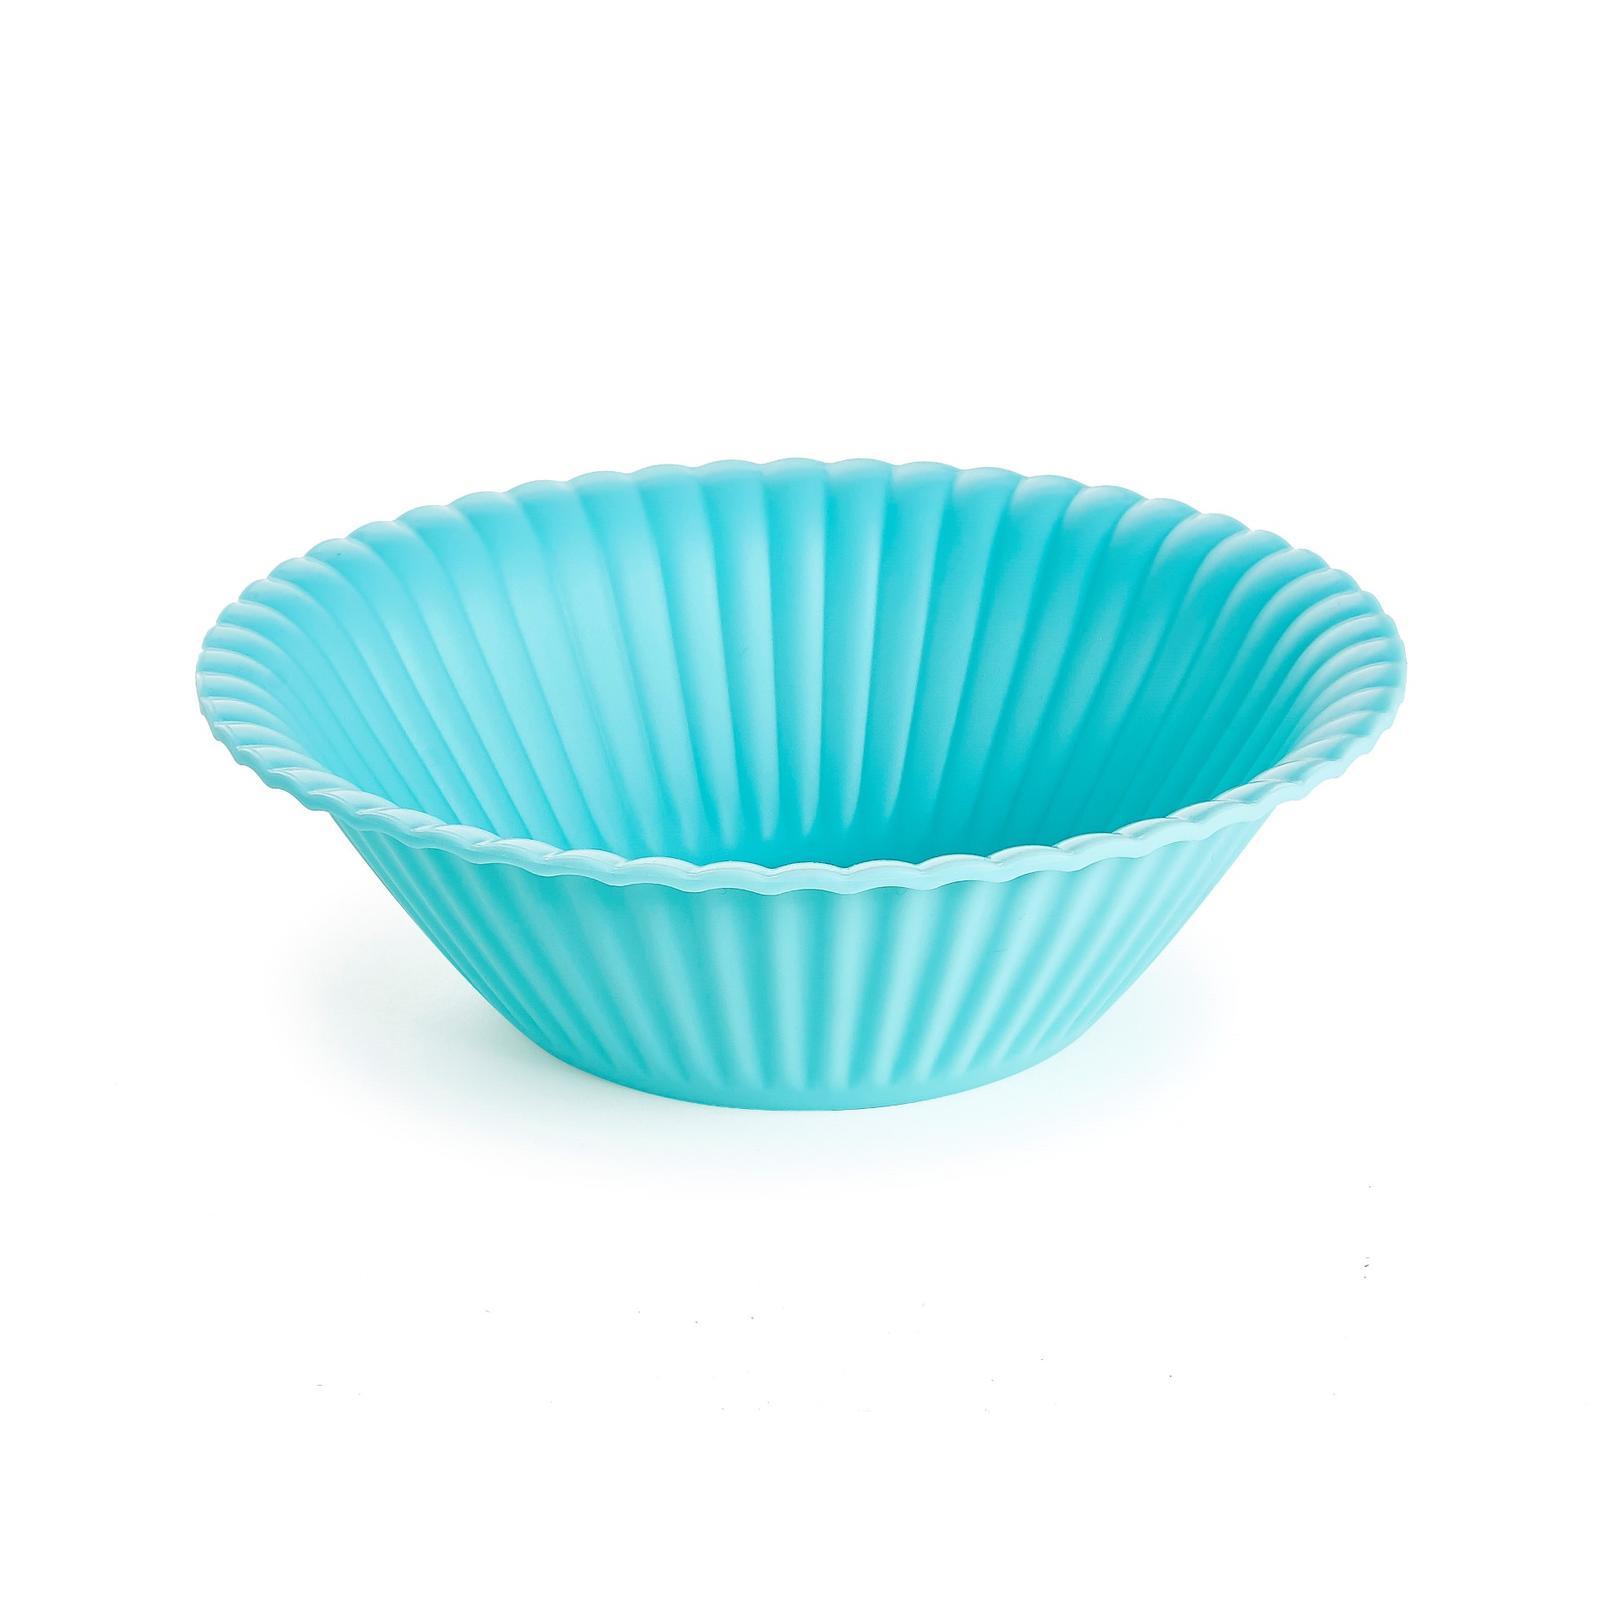 "Gourmet Solutions Reusable Melamine 7.75"" Bowl PartNumber: 02410818000P KsnValue: 9307104 MfgPartNumber: 3207437"